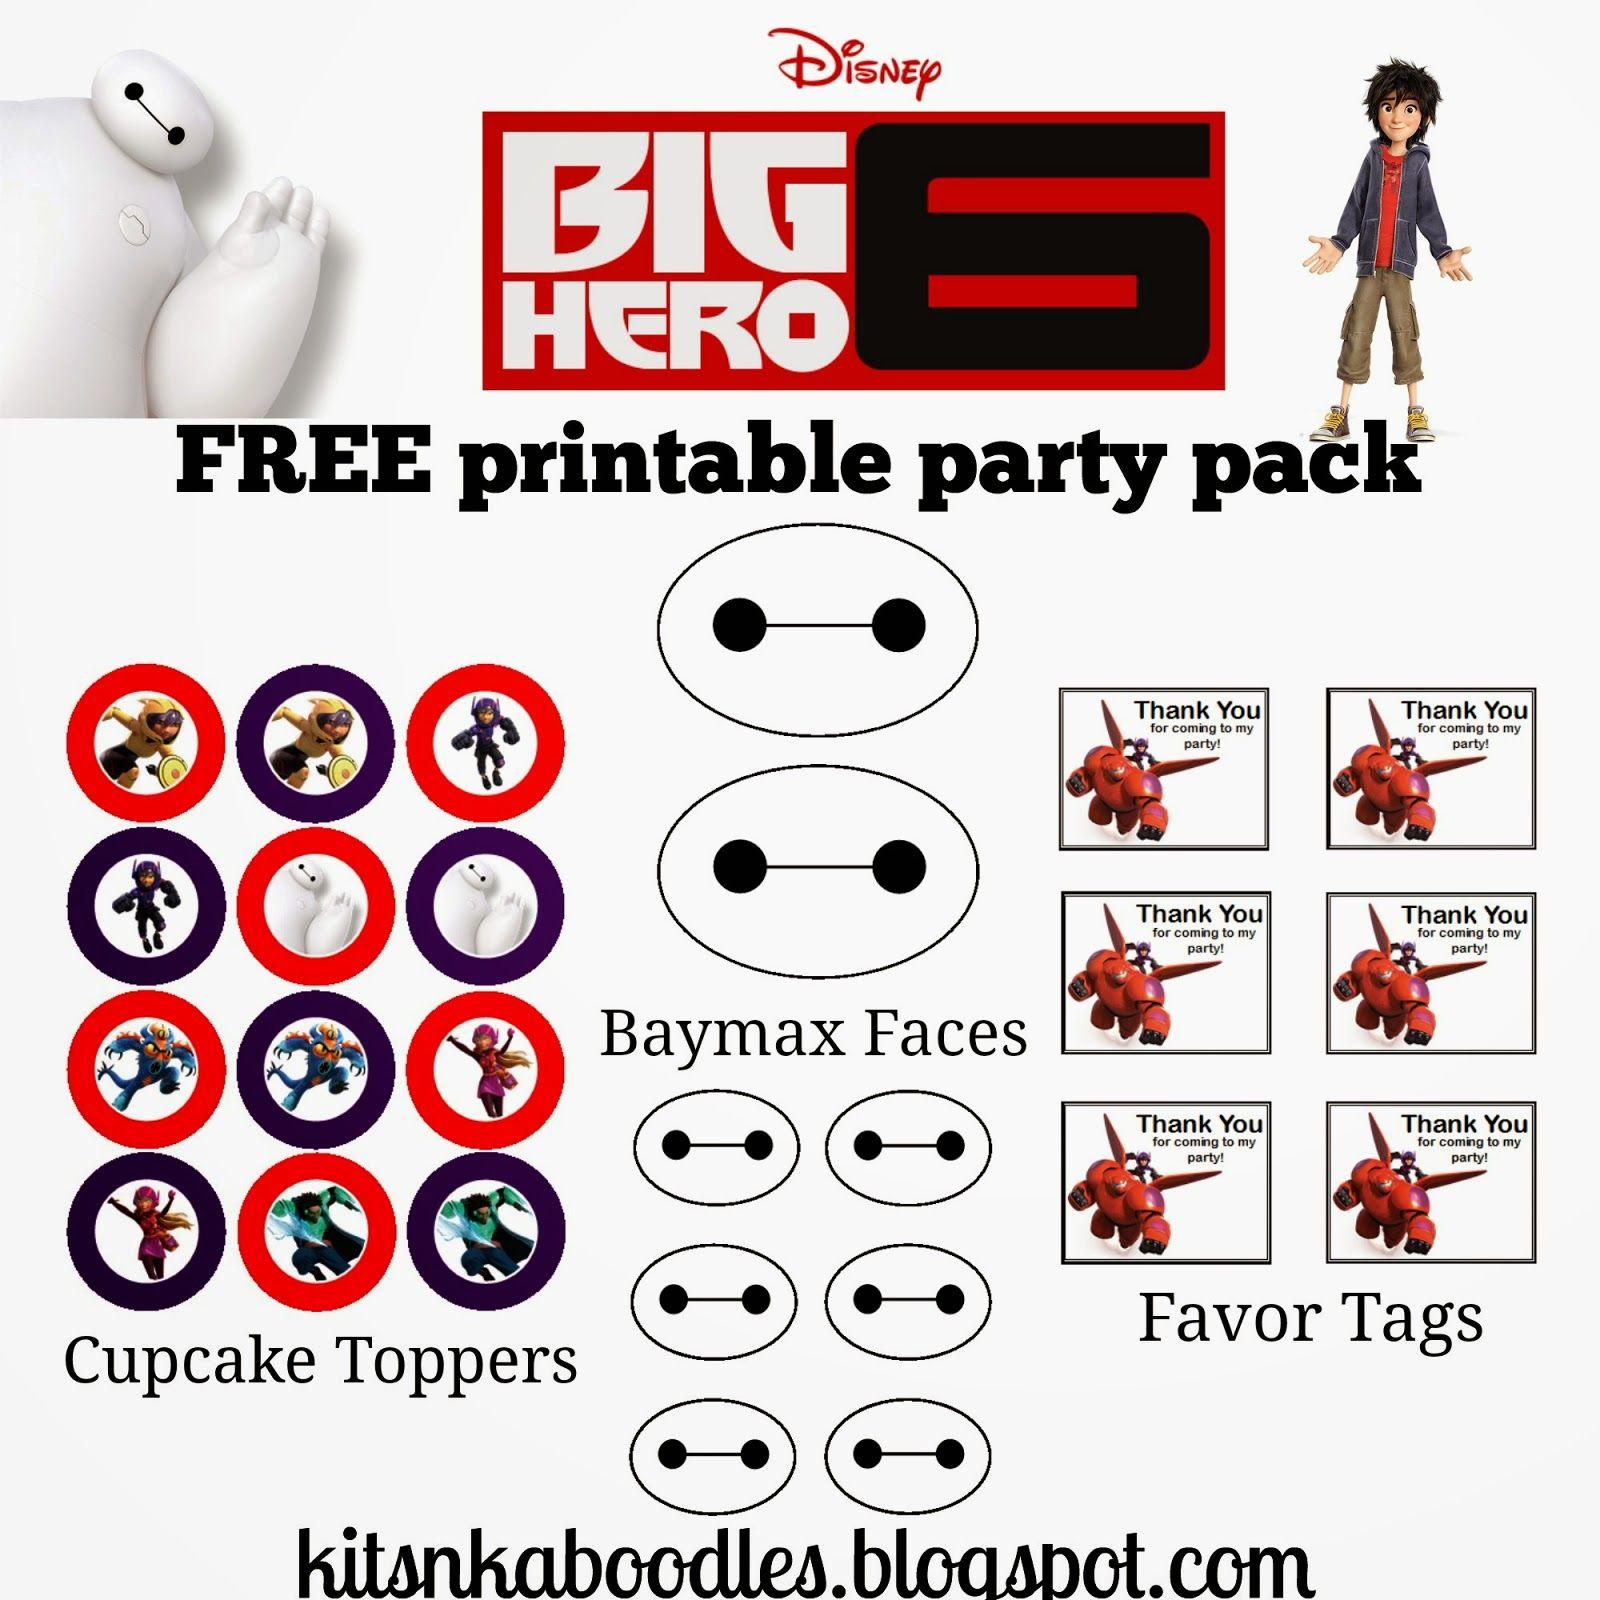 The Kits N Kaboodles Blog Big Hero 6 Free Party Pack